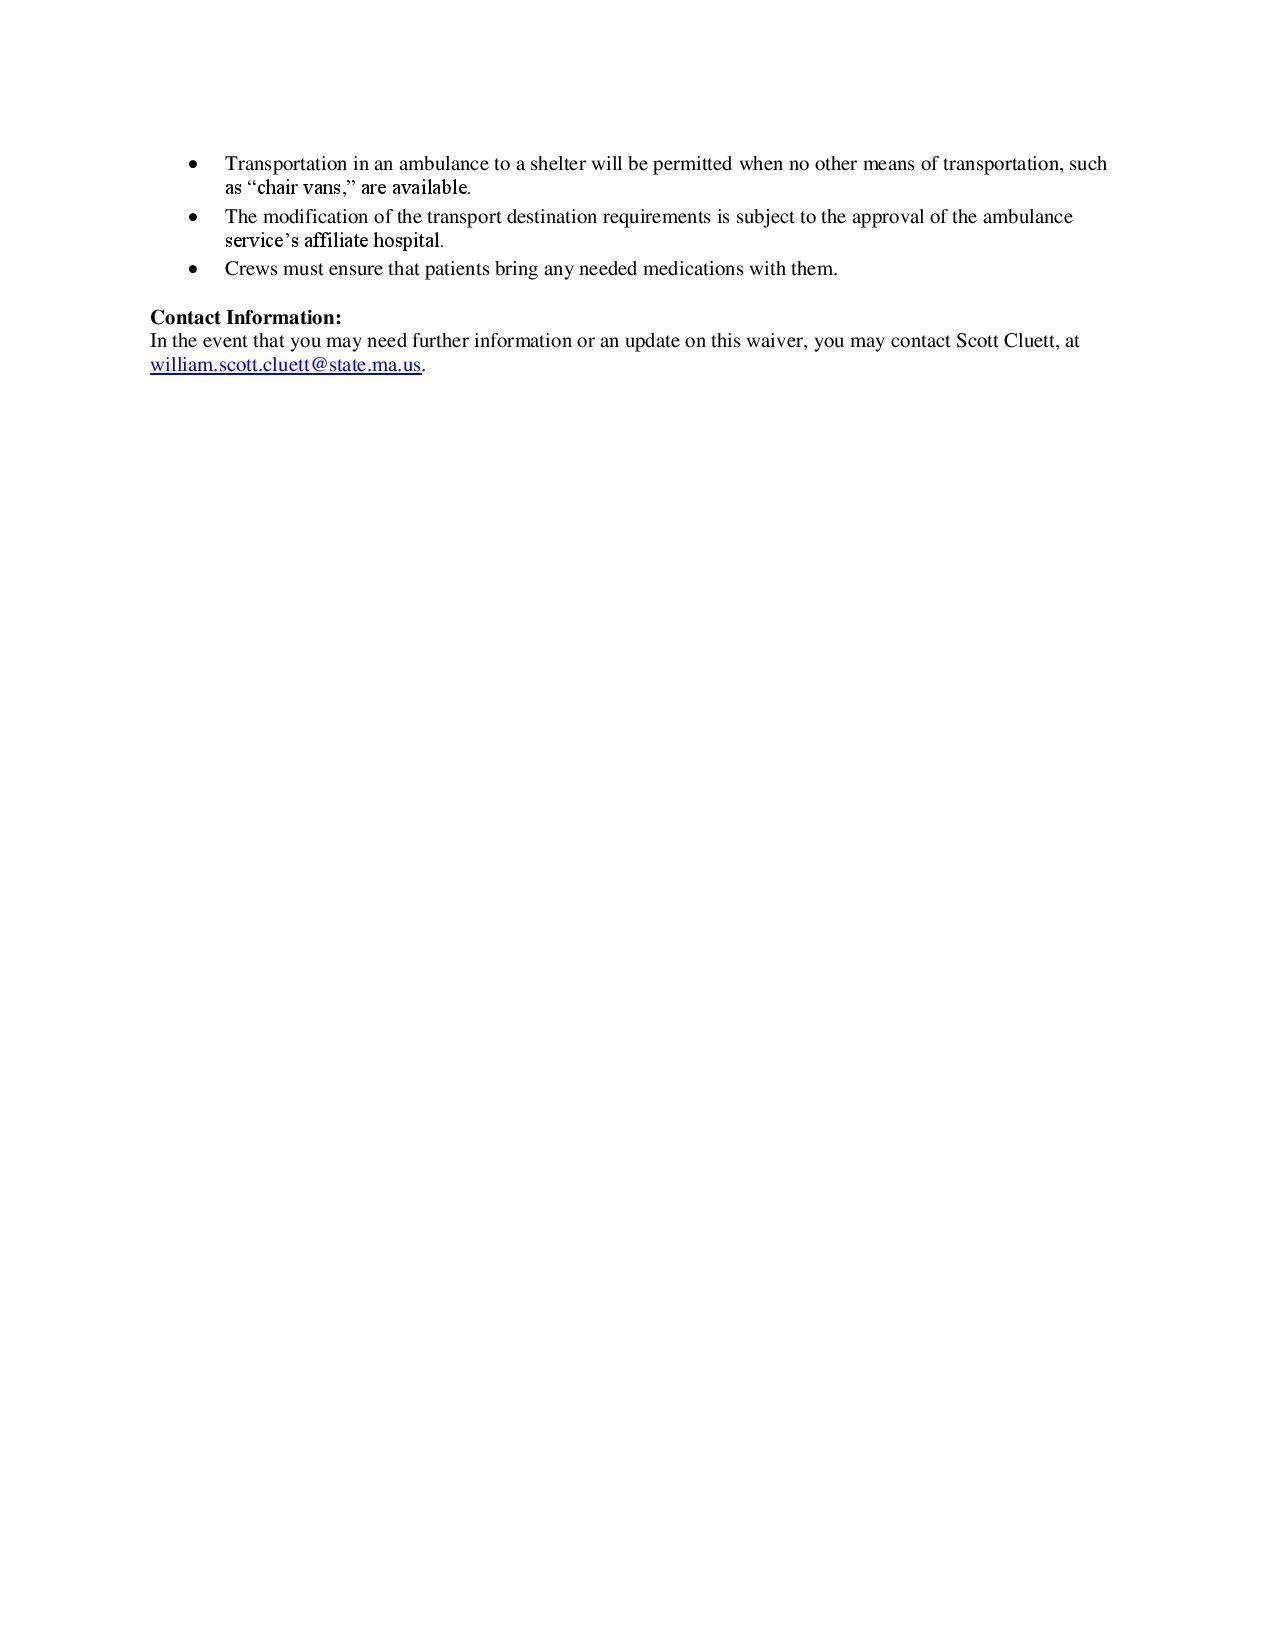 Heat Emergency Waiver Final-page-002.jpg